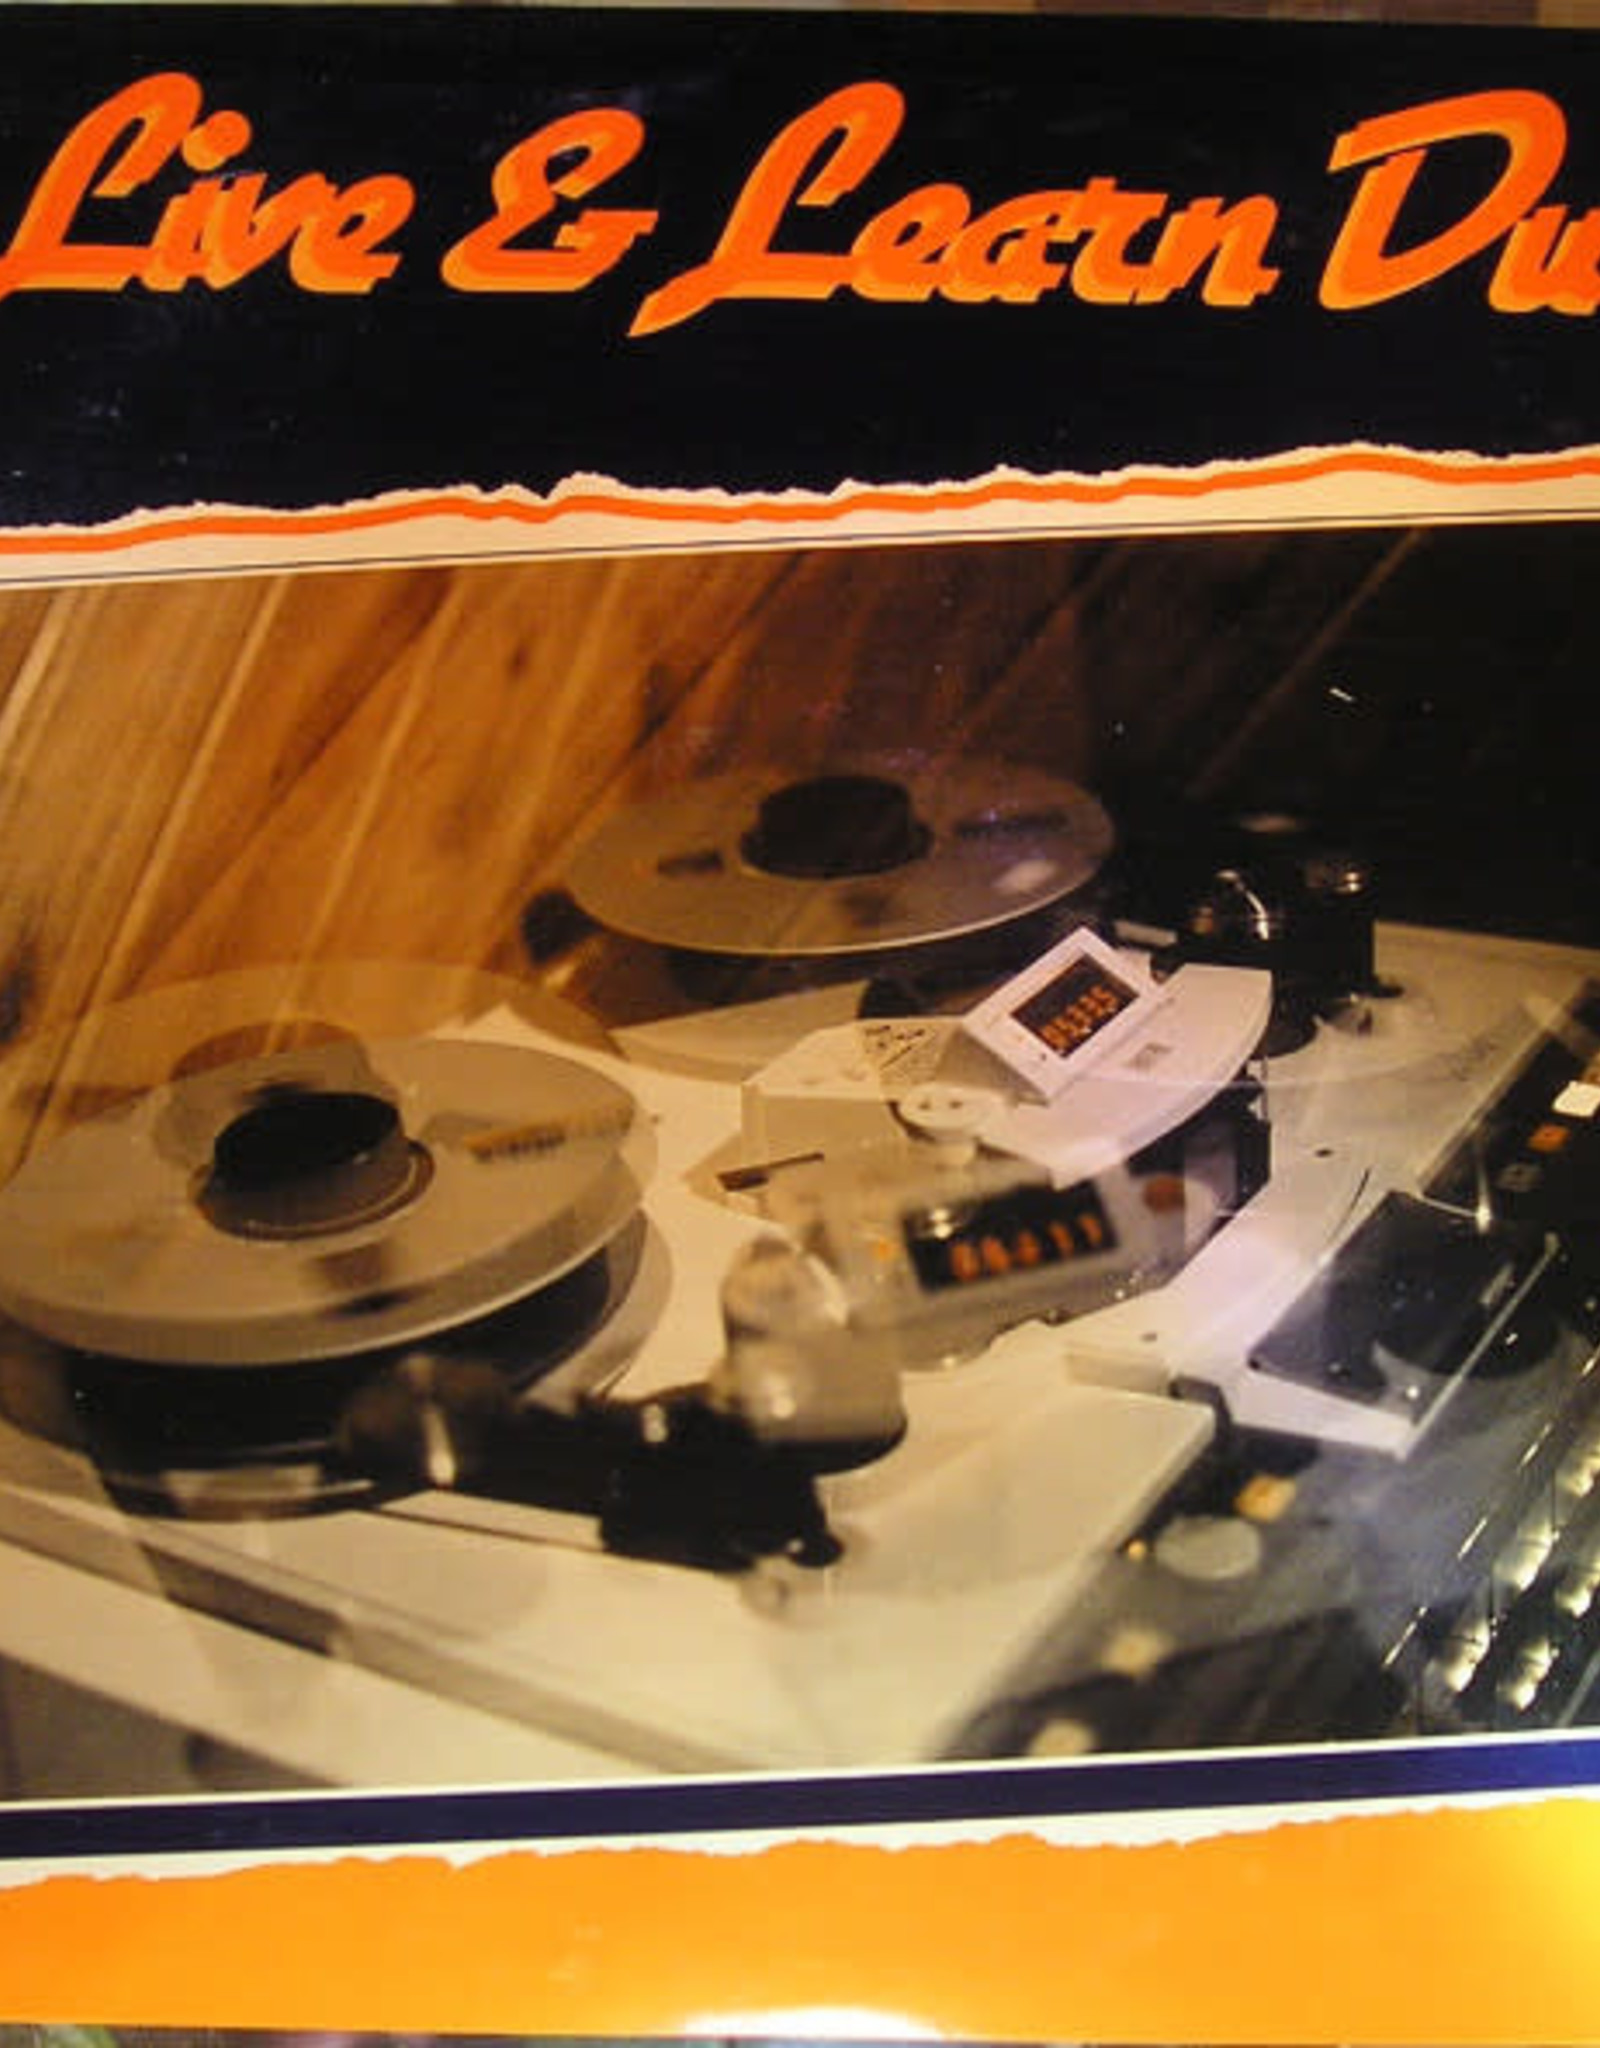 Live & Learn Dub